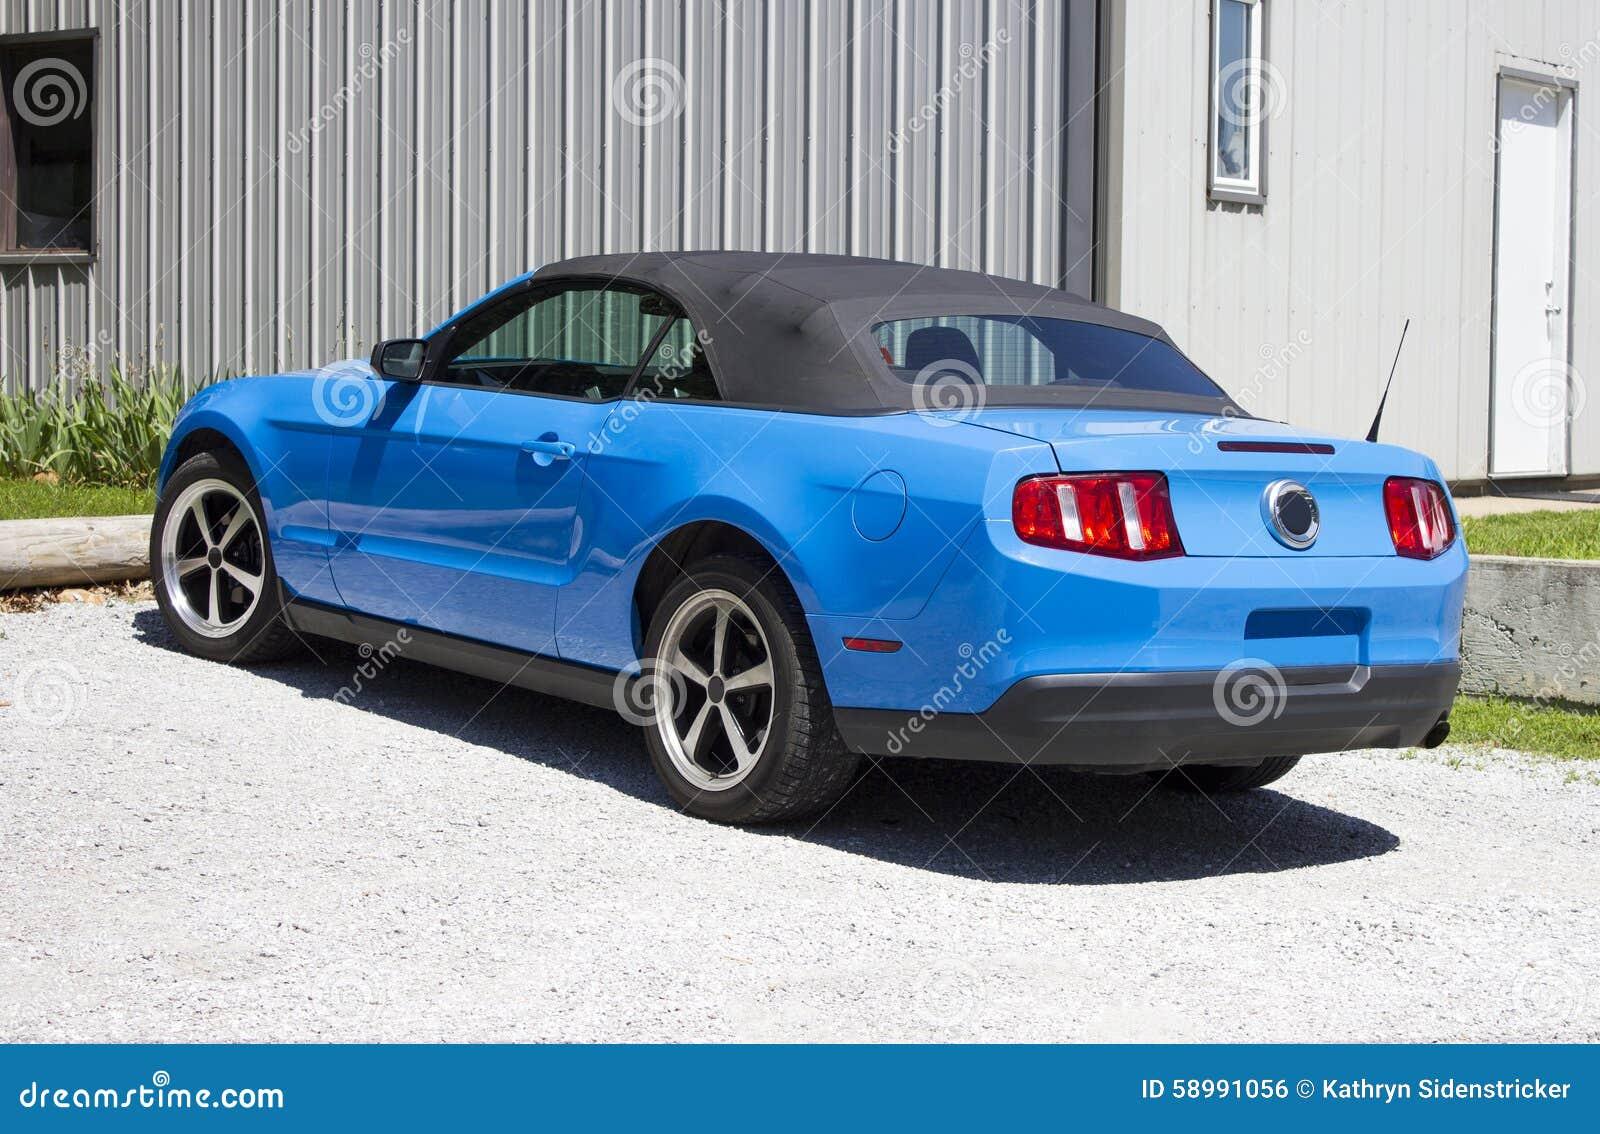 2014 mustang grabber blue convertible stock photo image 58991056. Black Bedroom Furniture Sets. Home Design Ideas